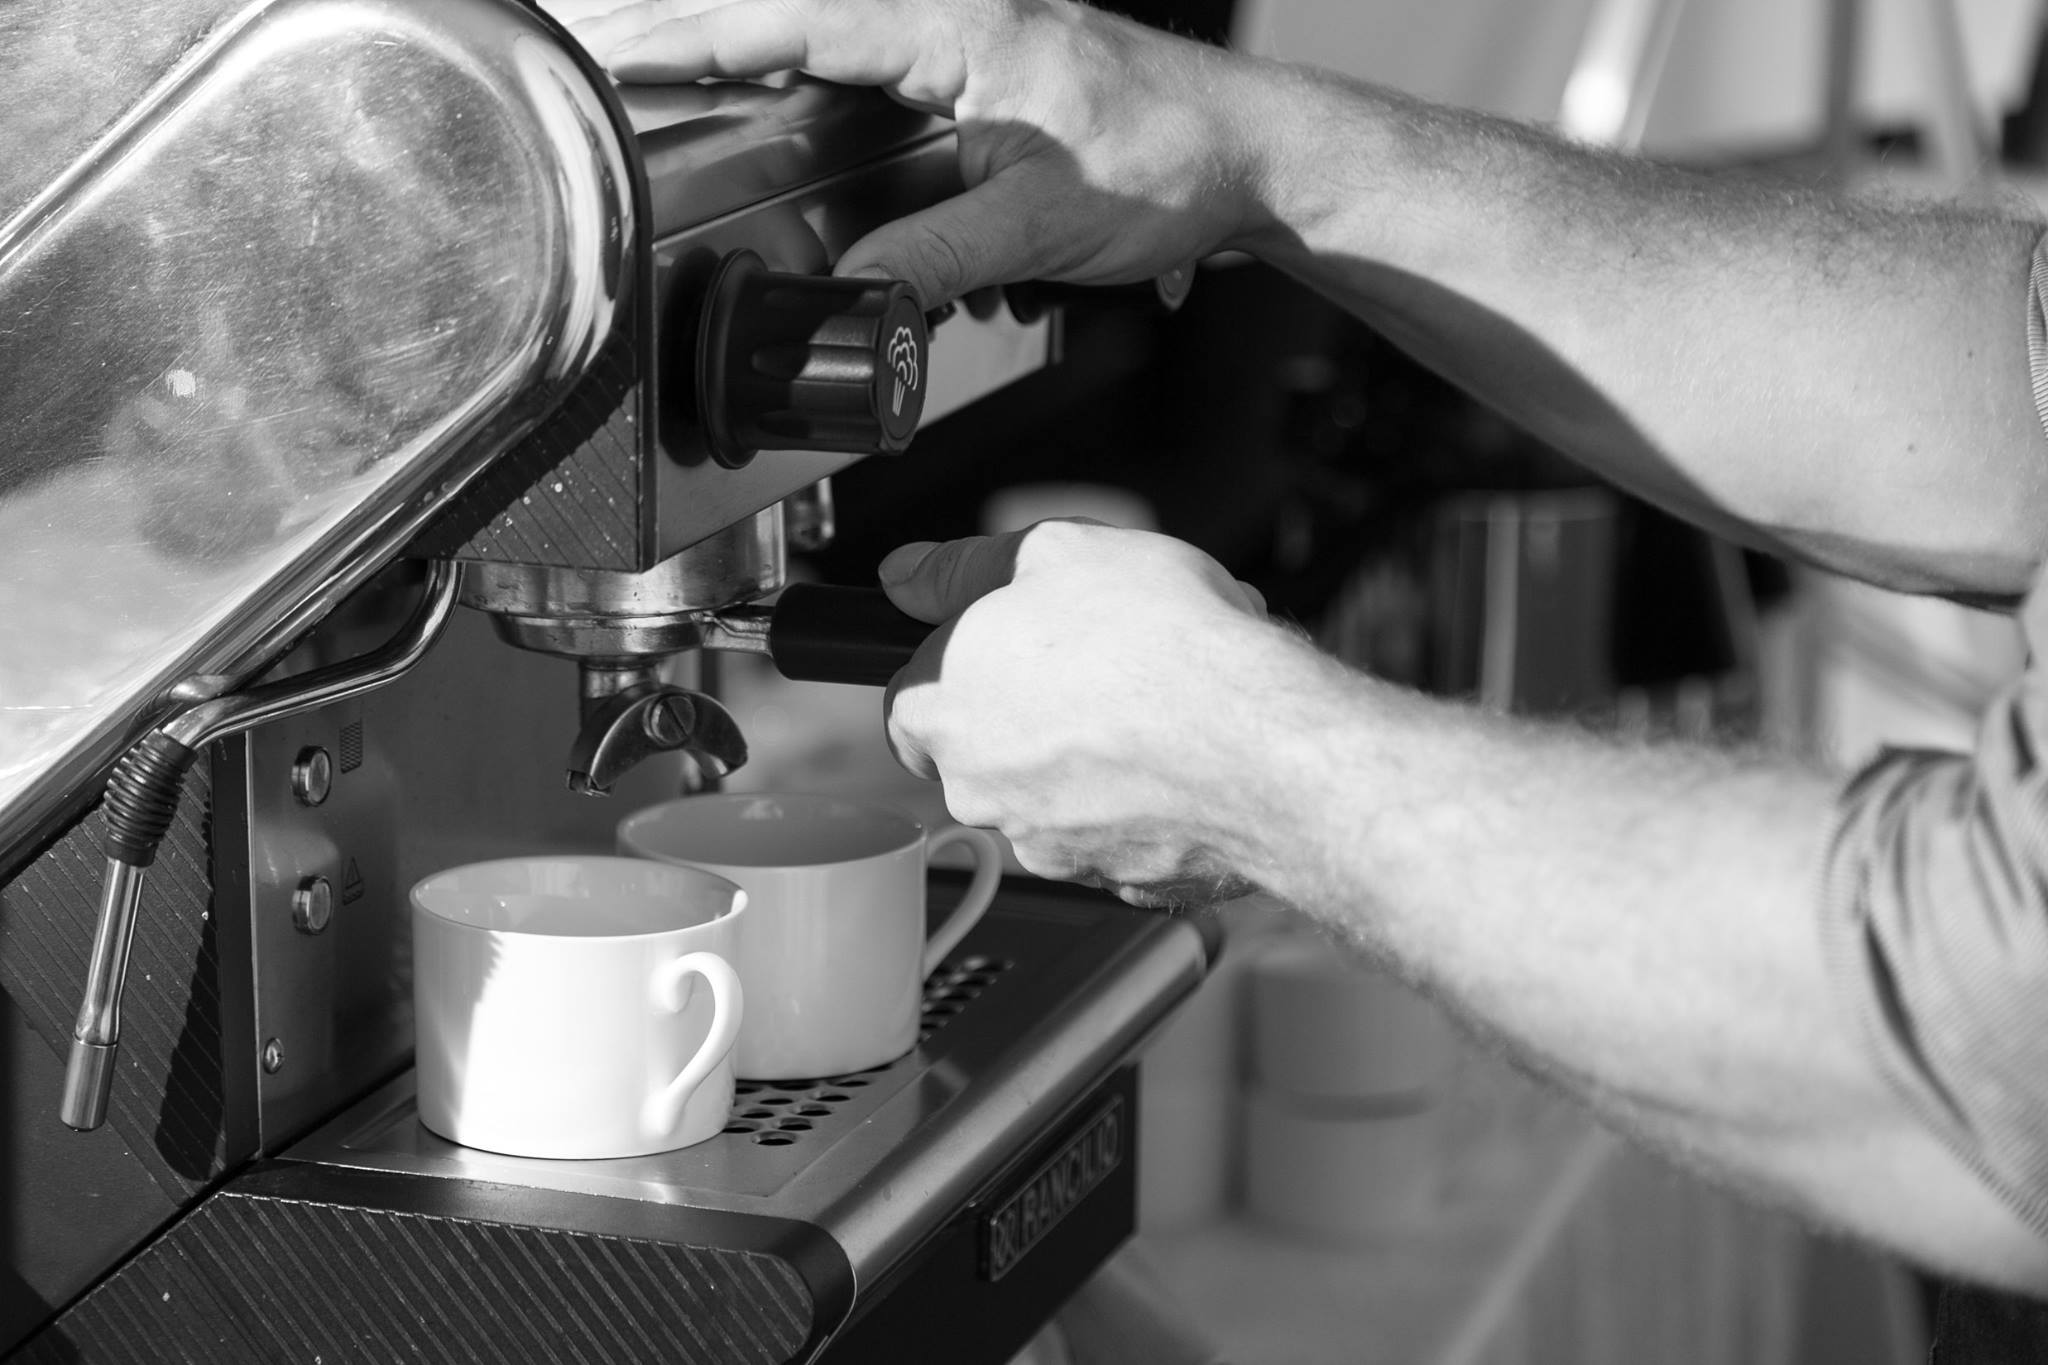 Pouring Espresso Shots